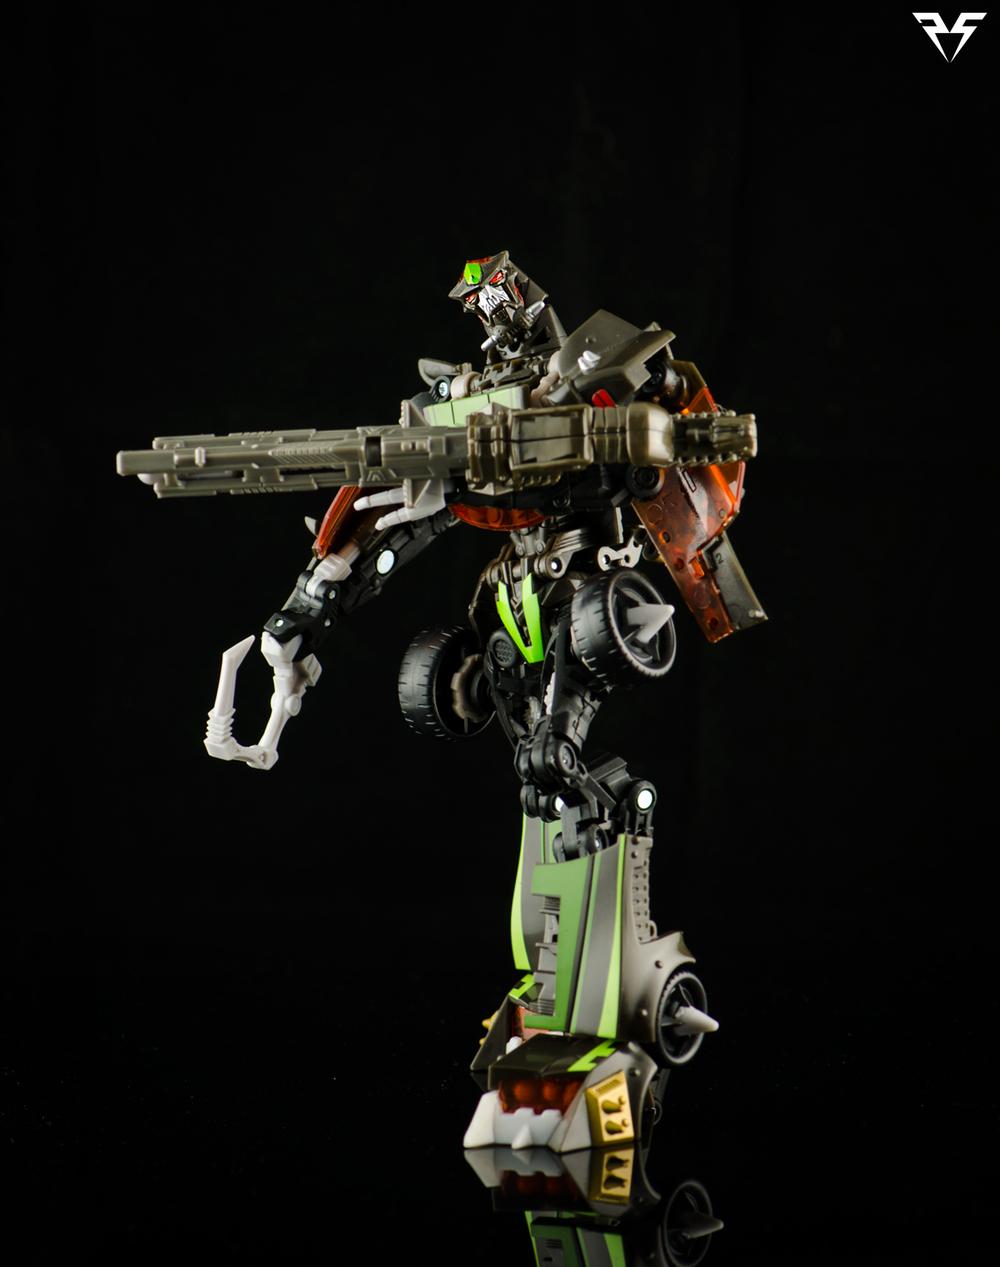 ROTFLockdown-Cannon.jpg